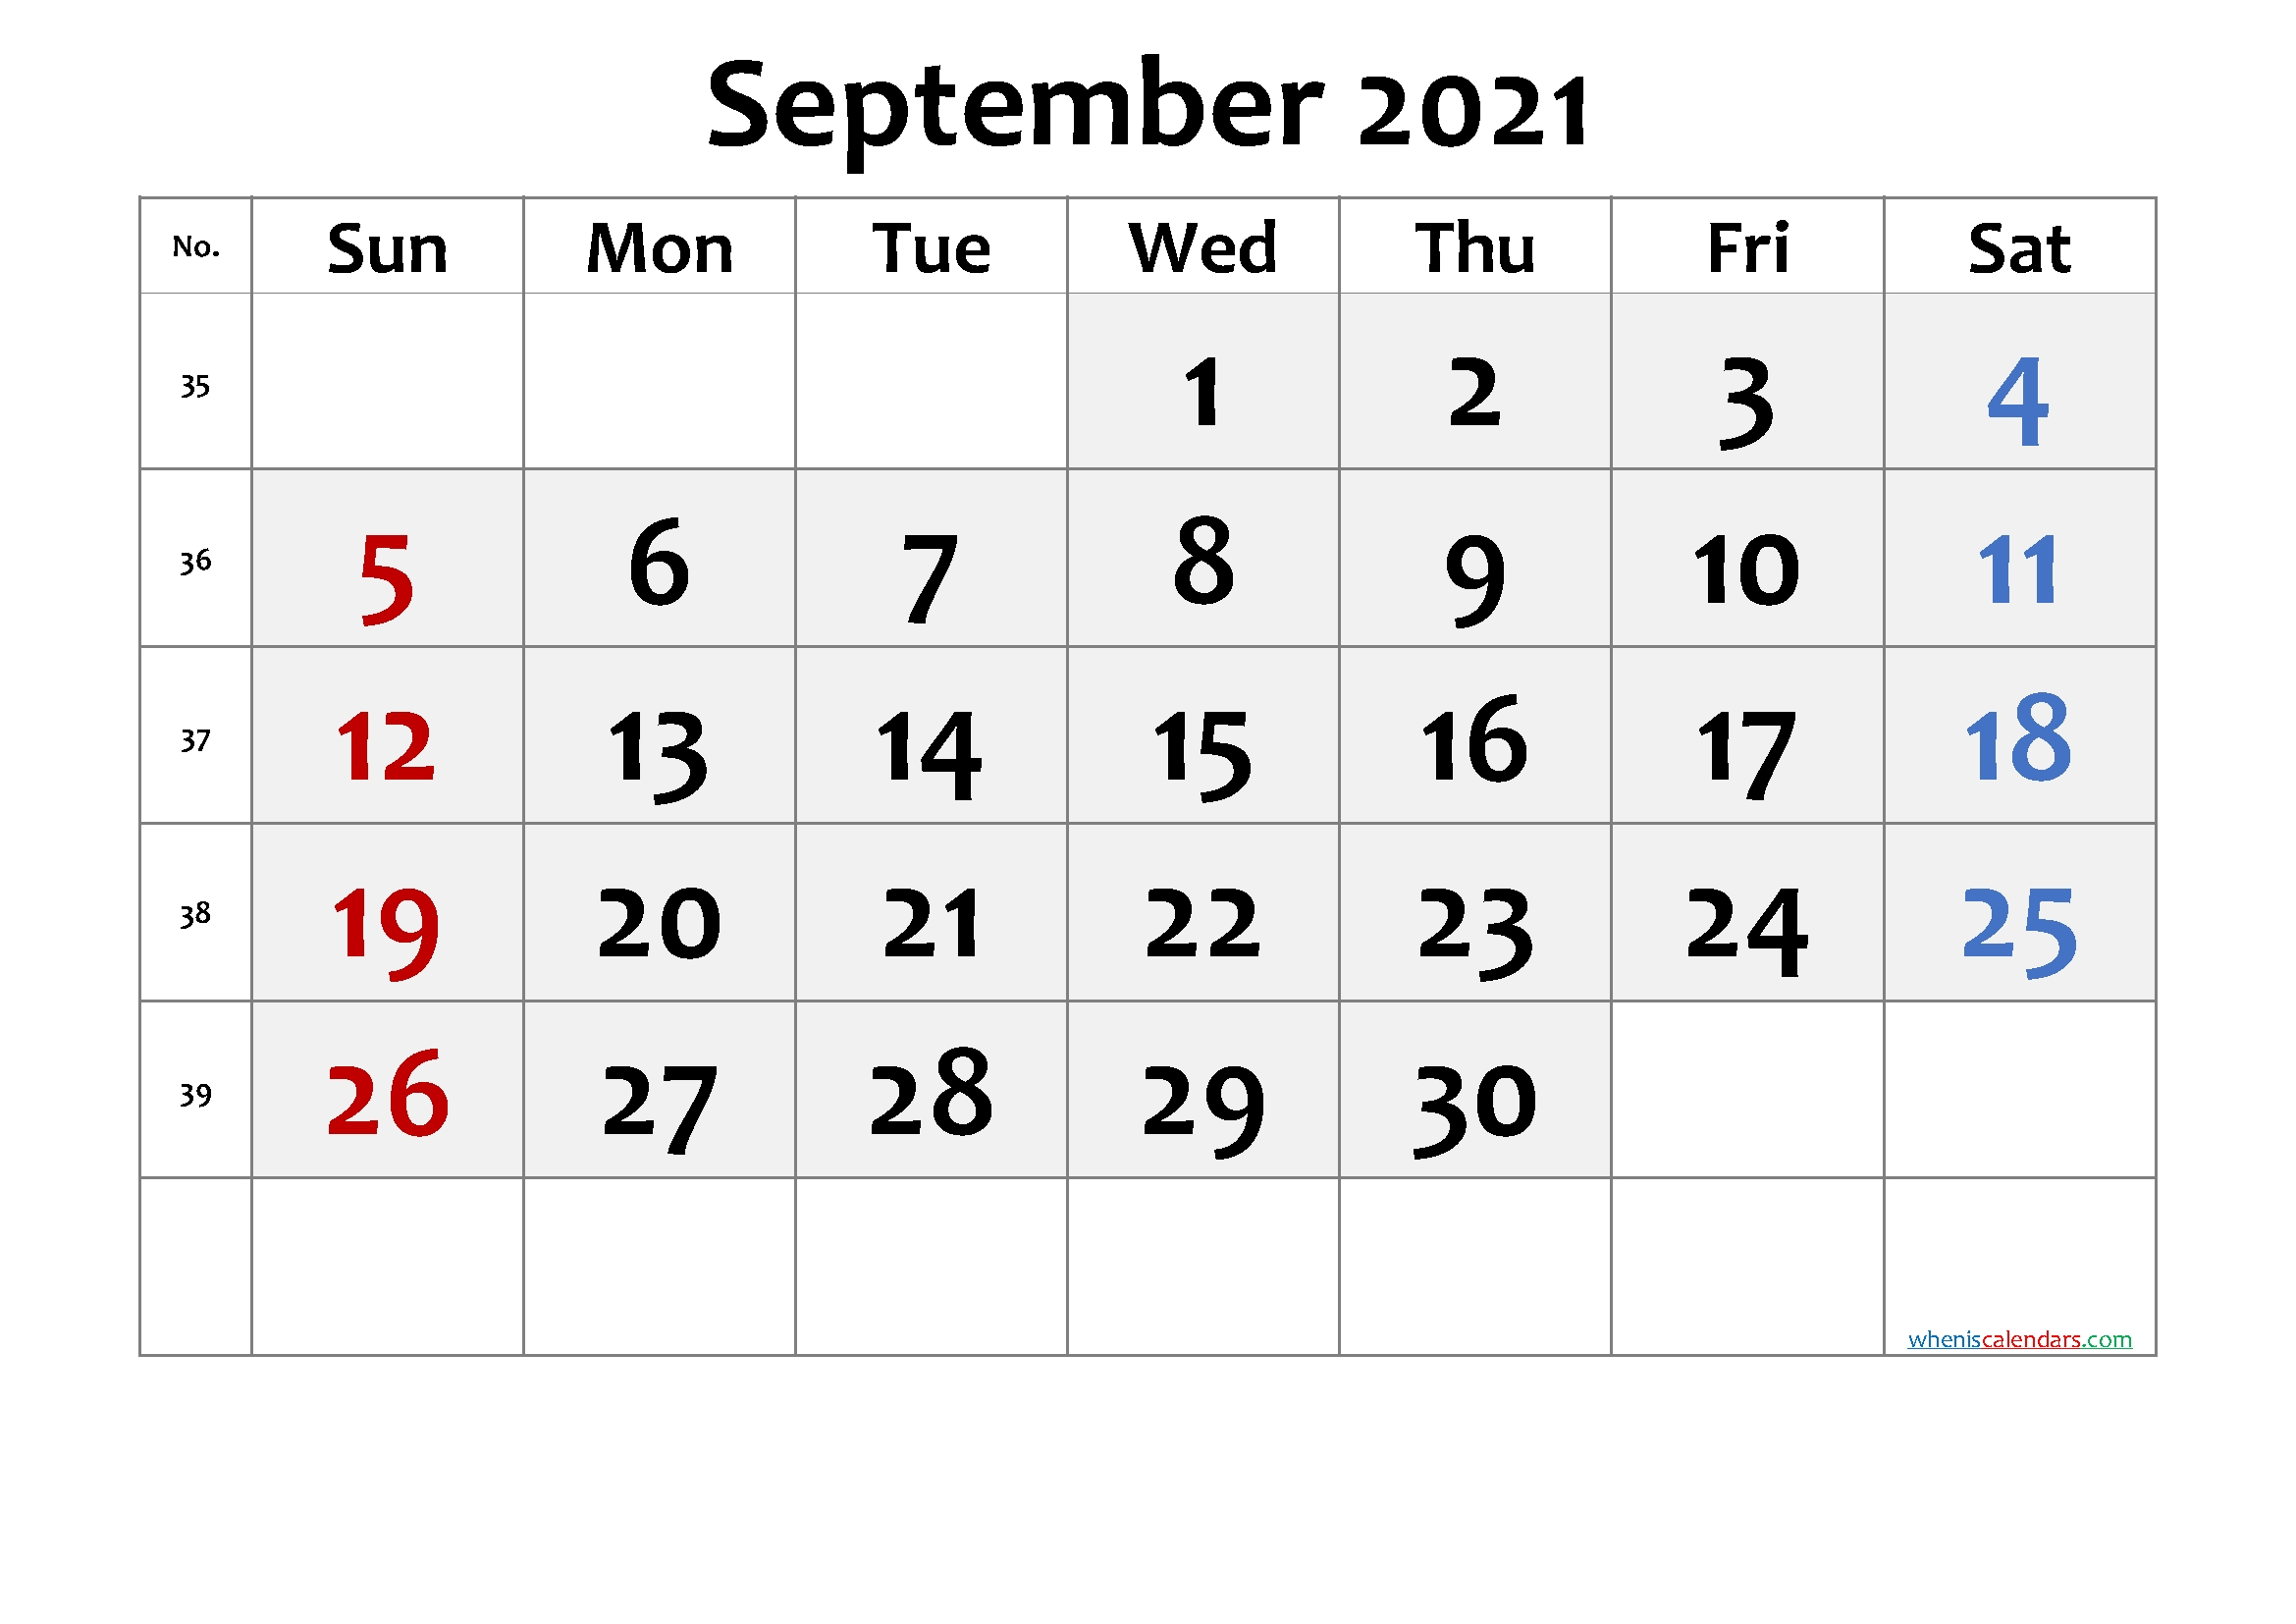 Free Printable Calendar 2021 September - 6 Templates September 2021 Calendar Template